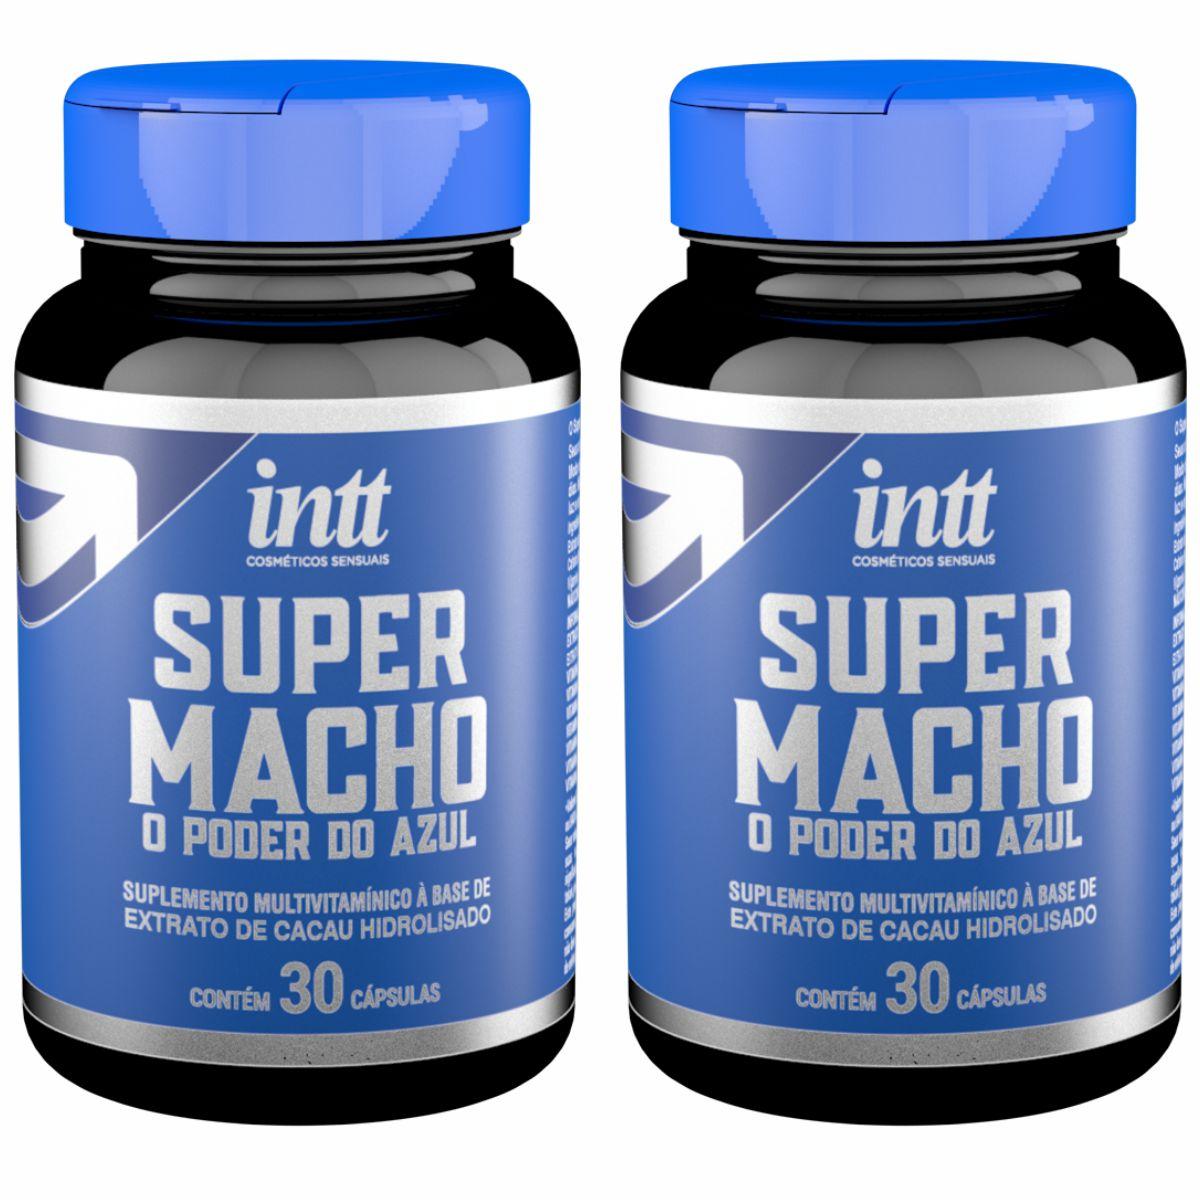 Super Macho Suplemento Potencializador Multivitamínico Masculino 60 Cápsulas Intt